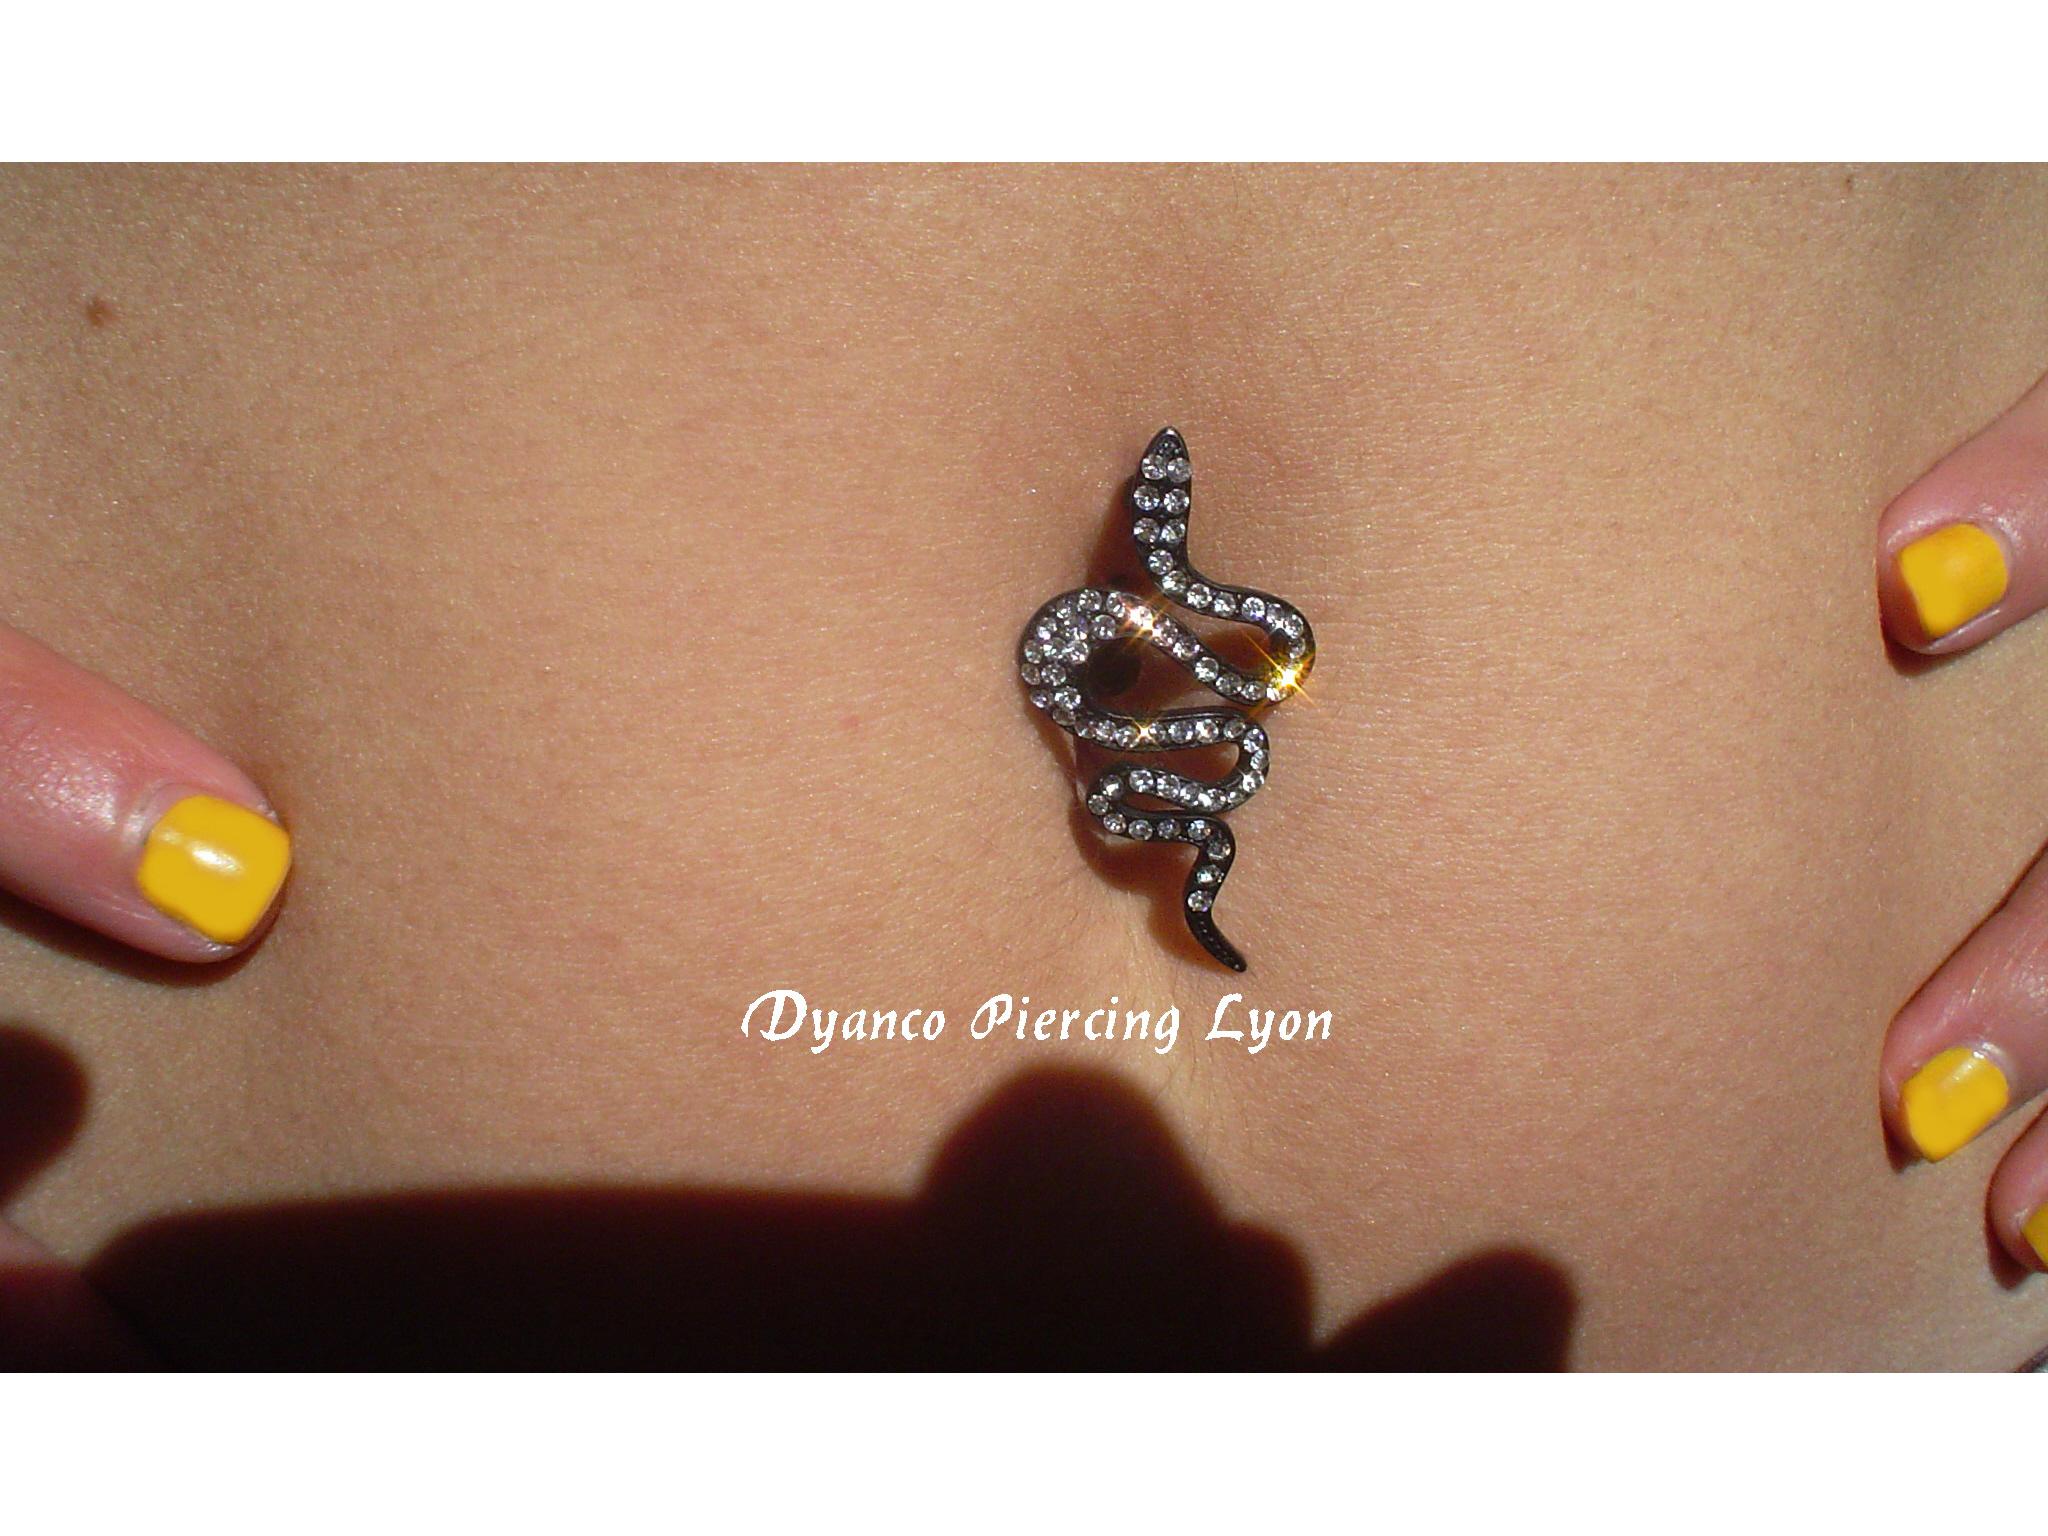 dyanco piercing lyon 70.jpg